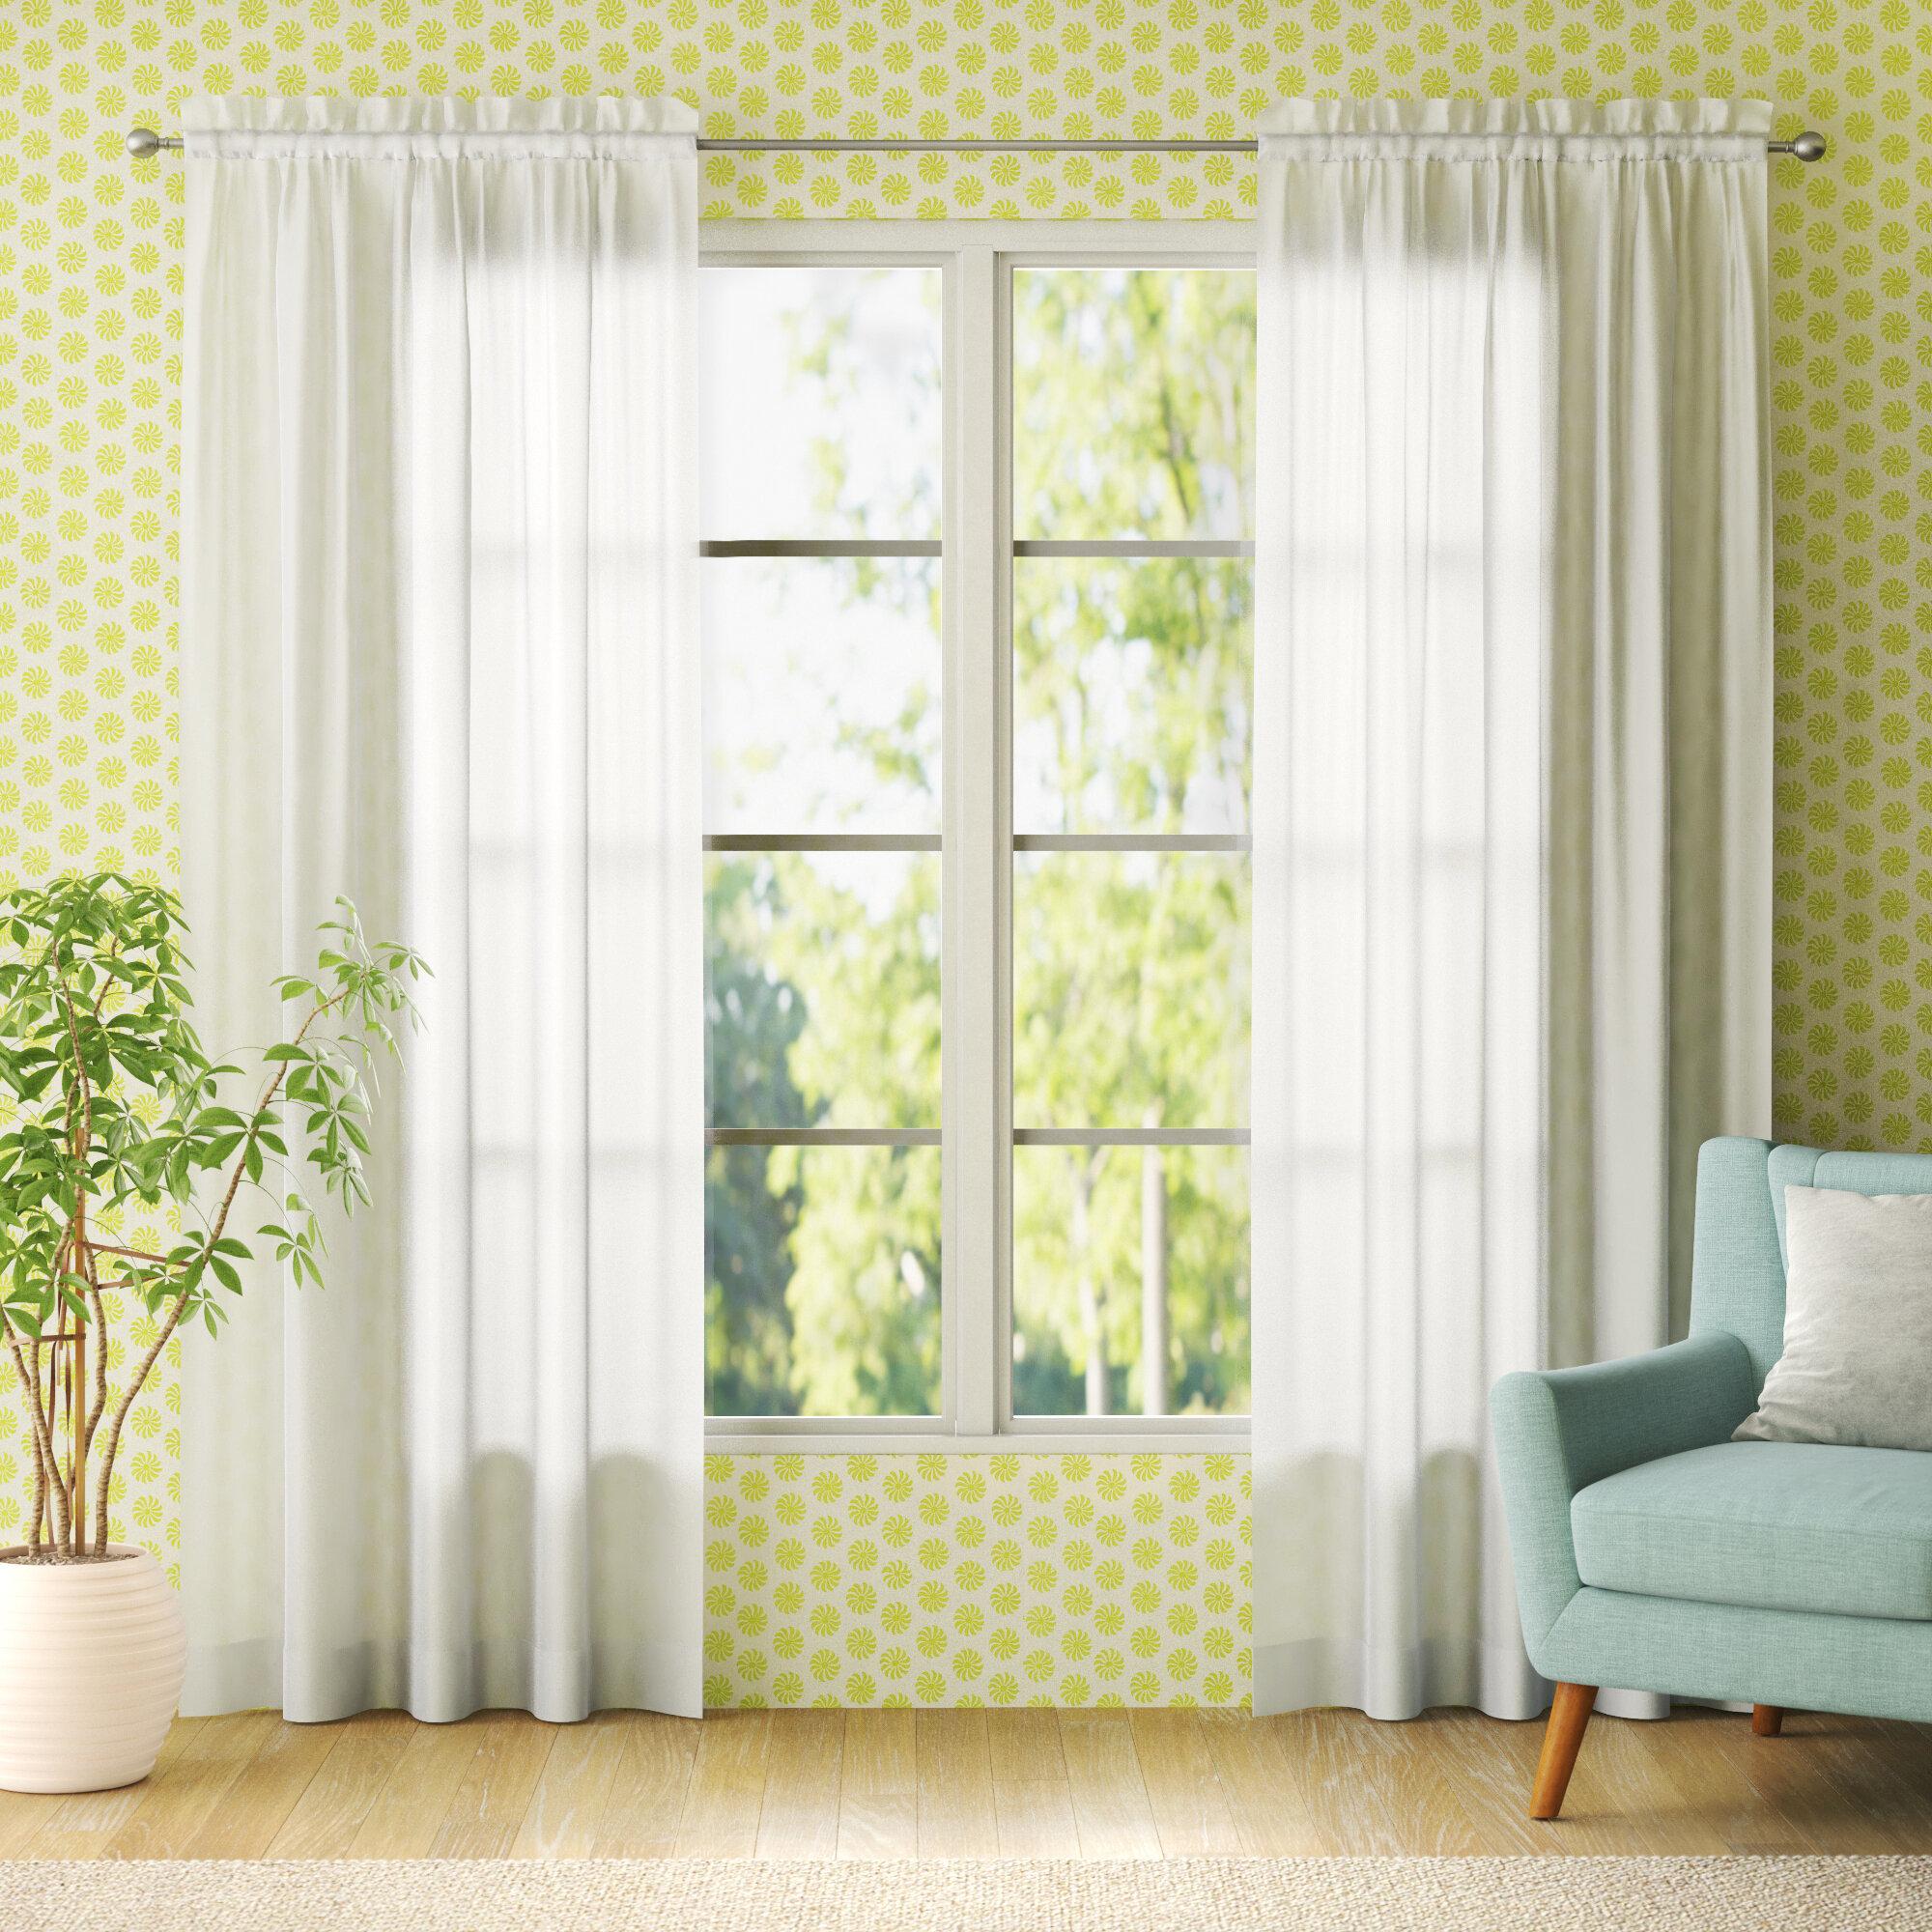 Wayfair Basics Solid Sheer Rod Pocket Curtain Panels Reviews Wayfair